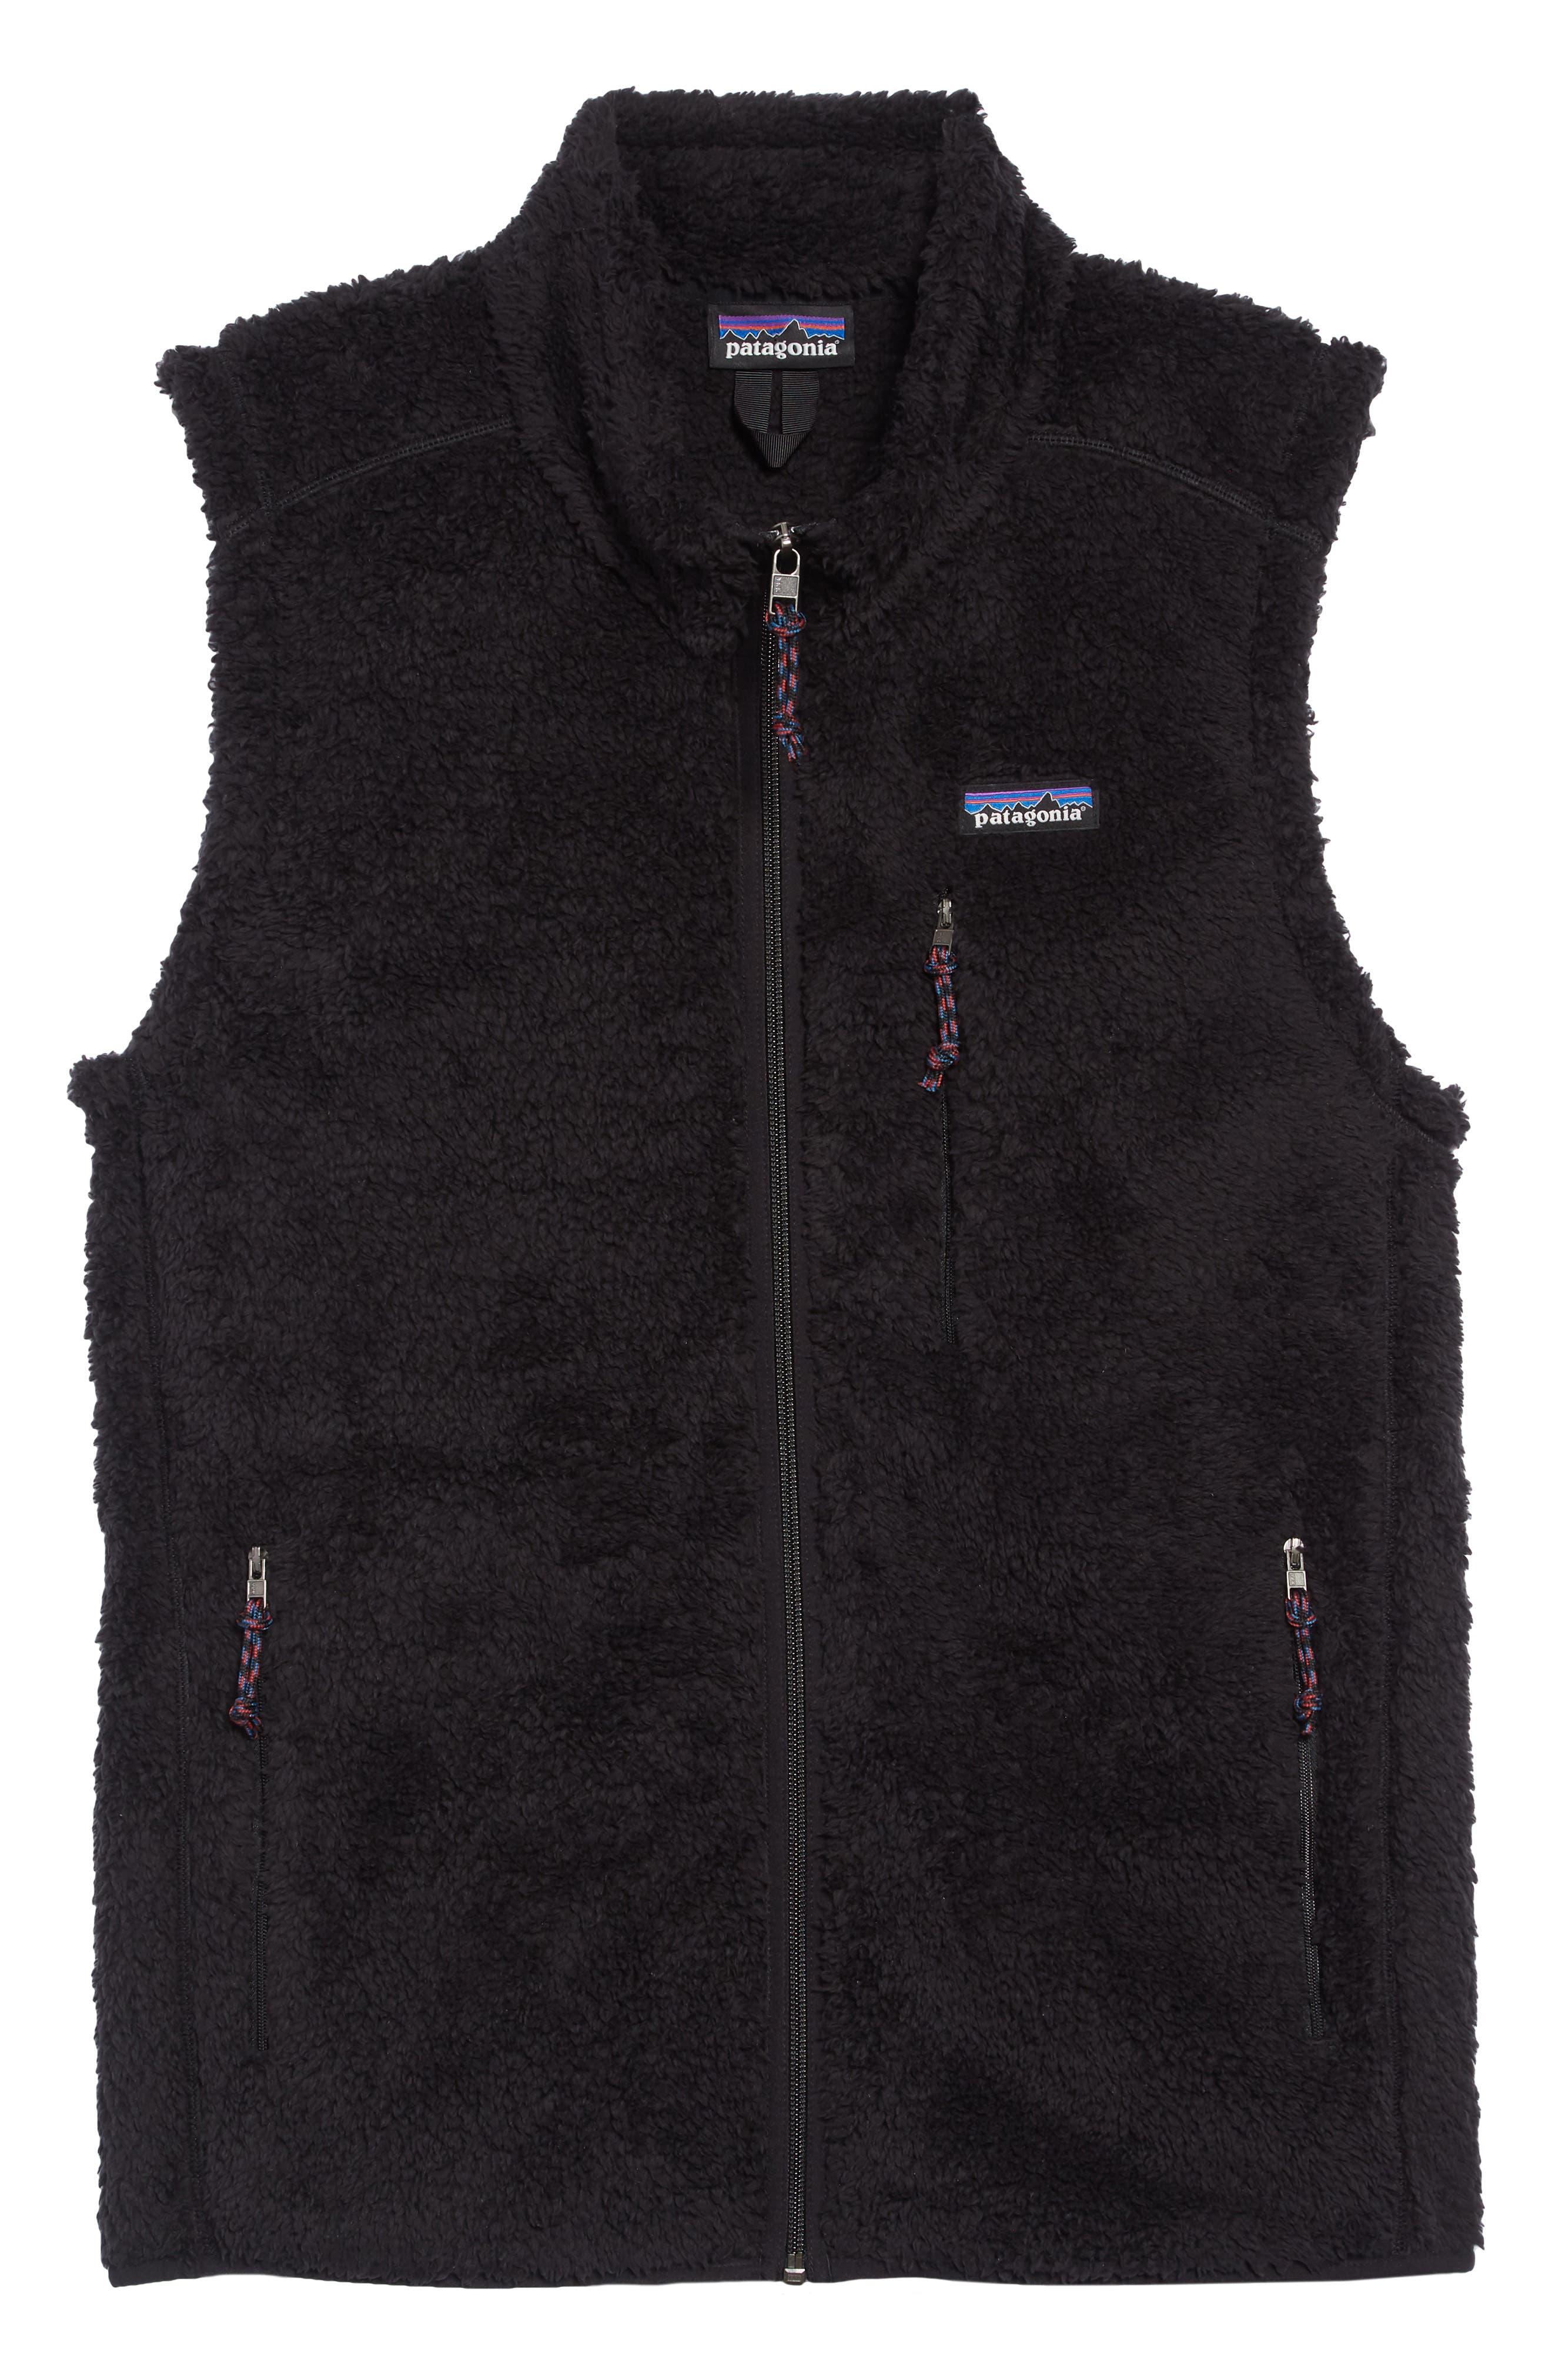 Los Gatos Fleece Vest,                             Alternate thumbnail 6, color,                             BLACK